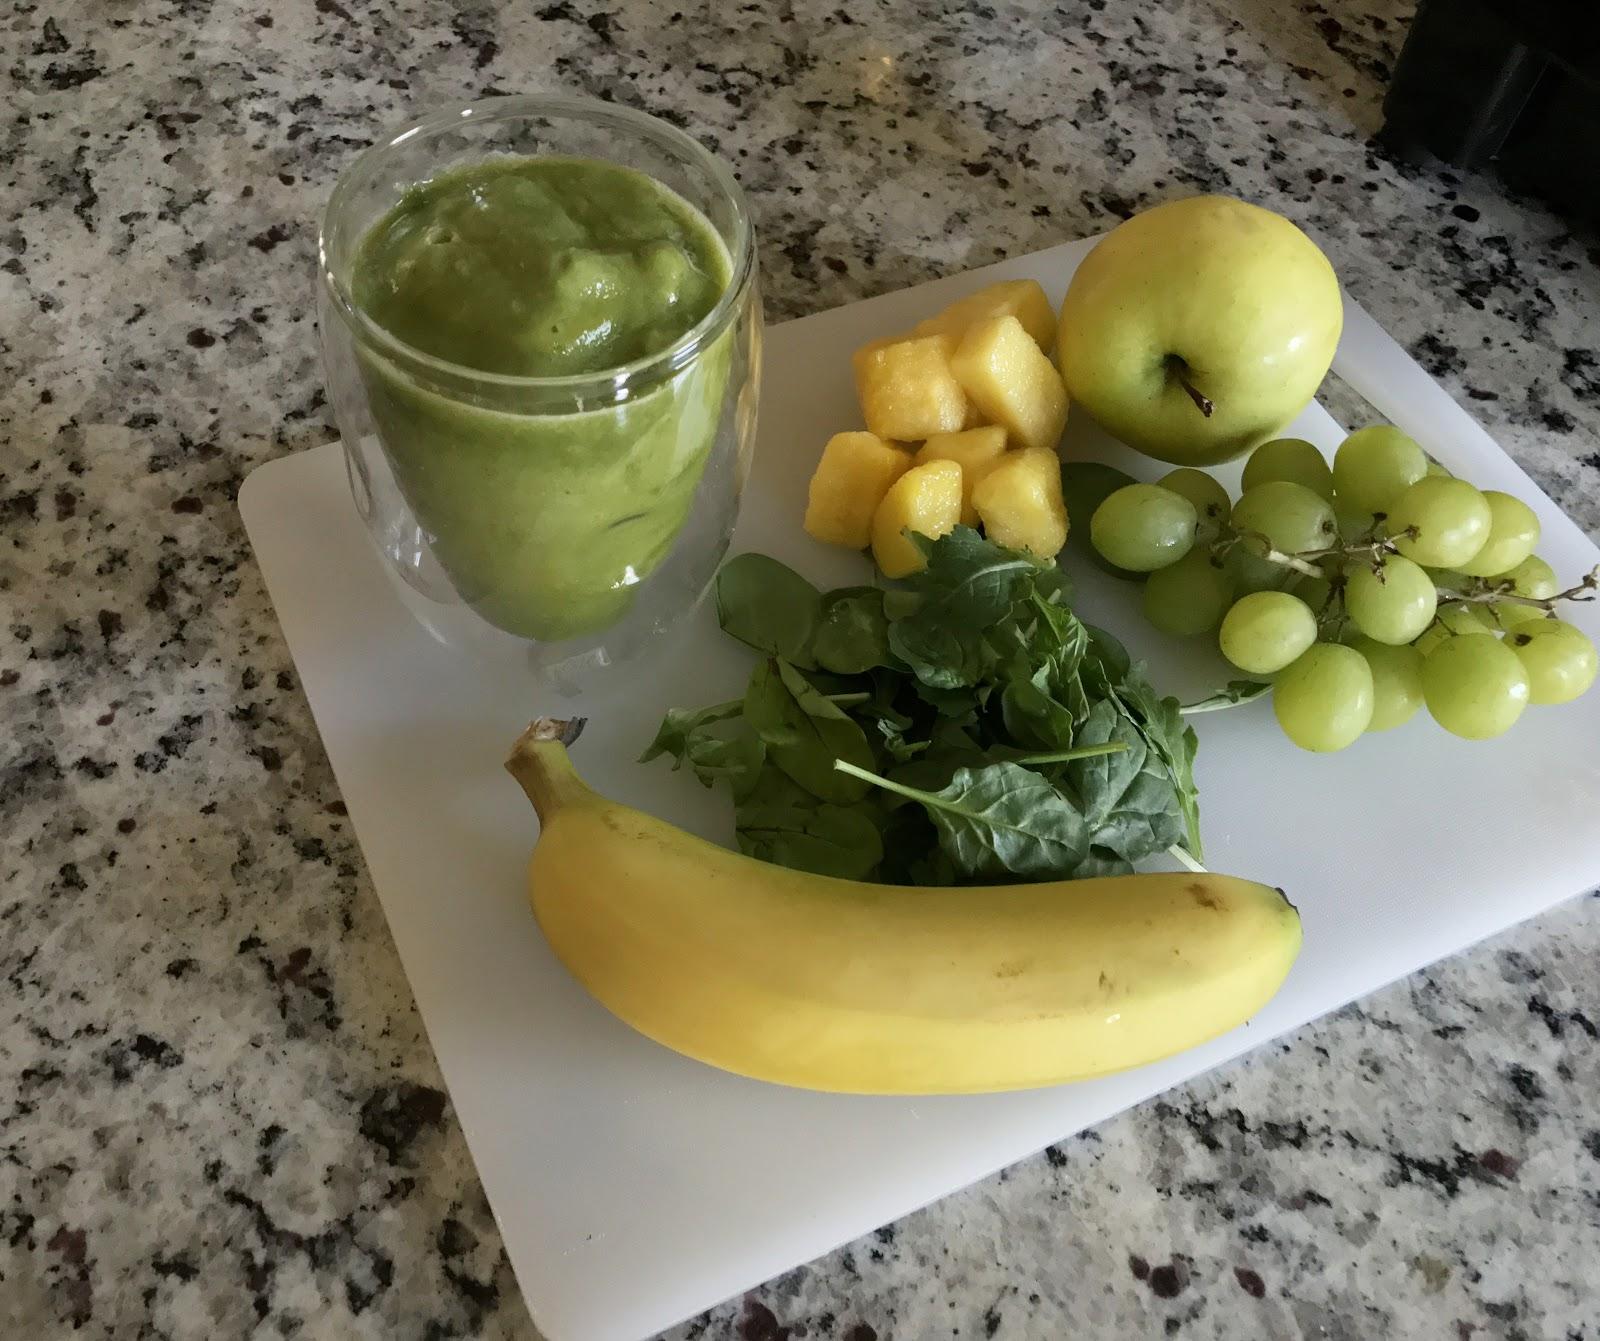 Healthy Summer Drink: Green Smoothie Recipe